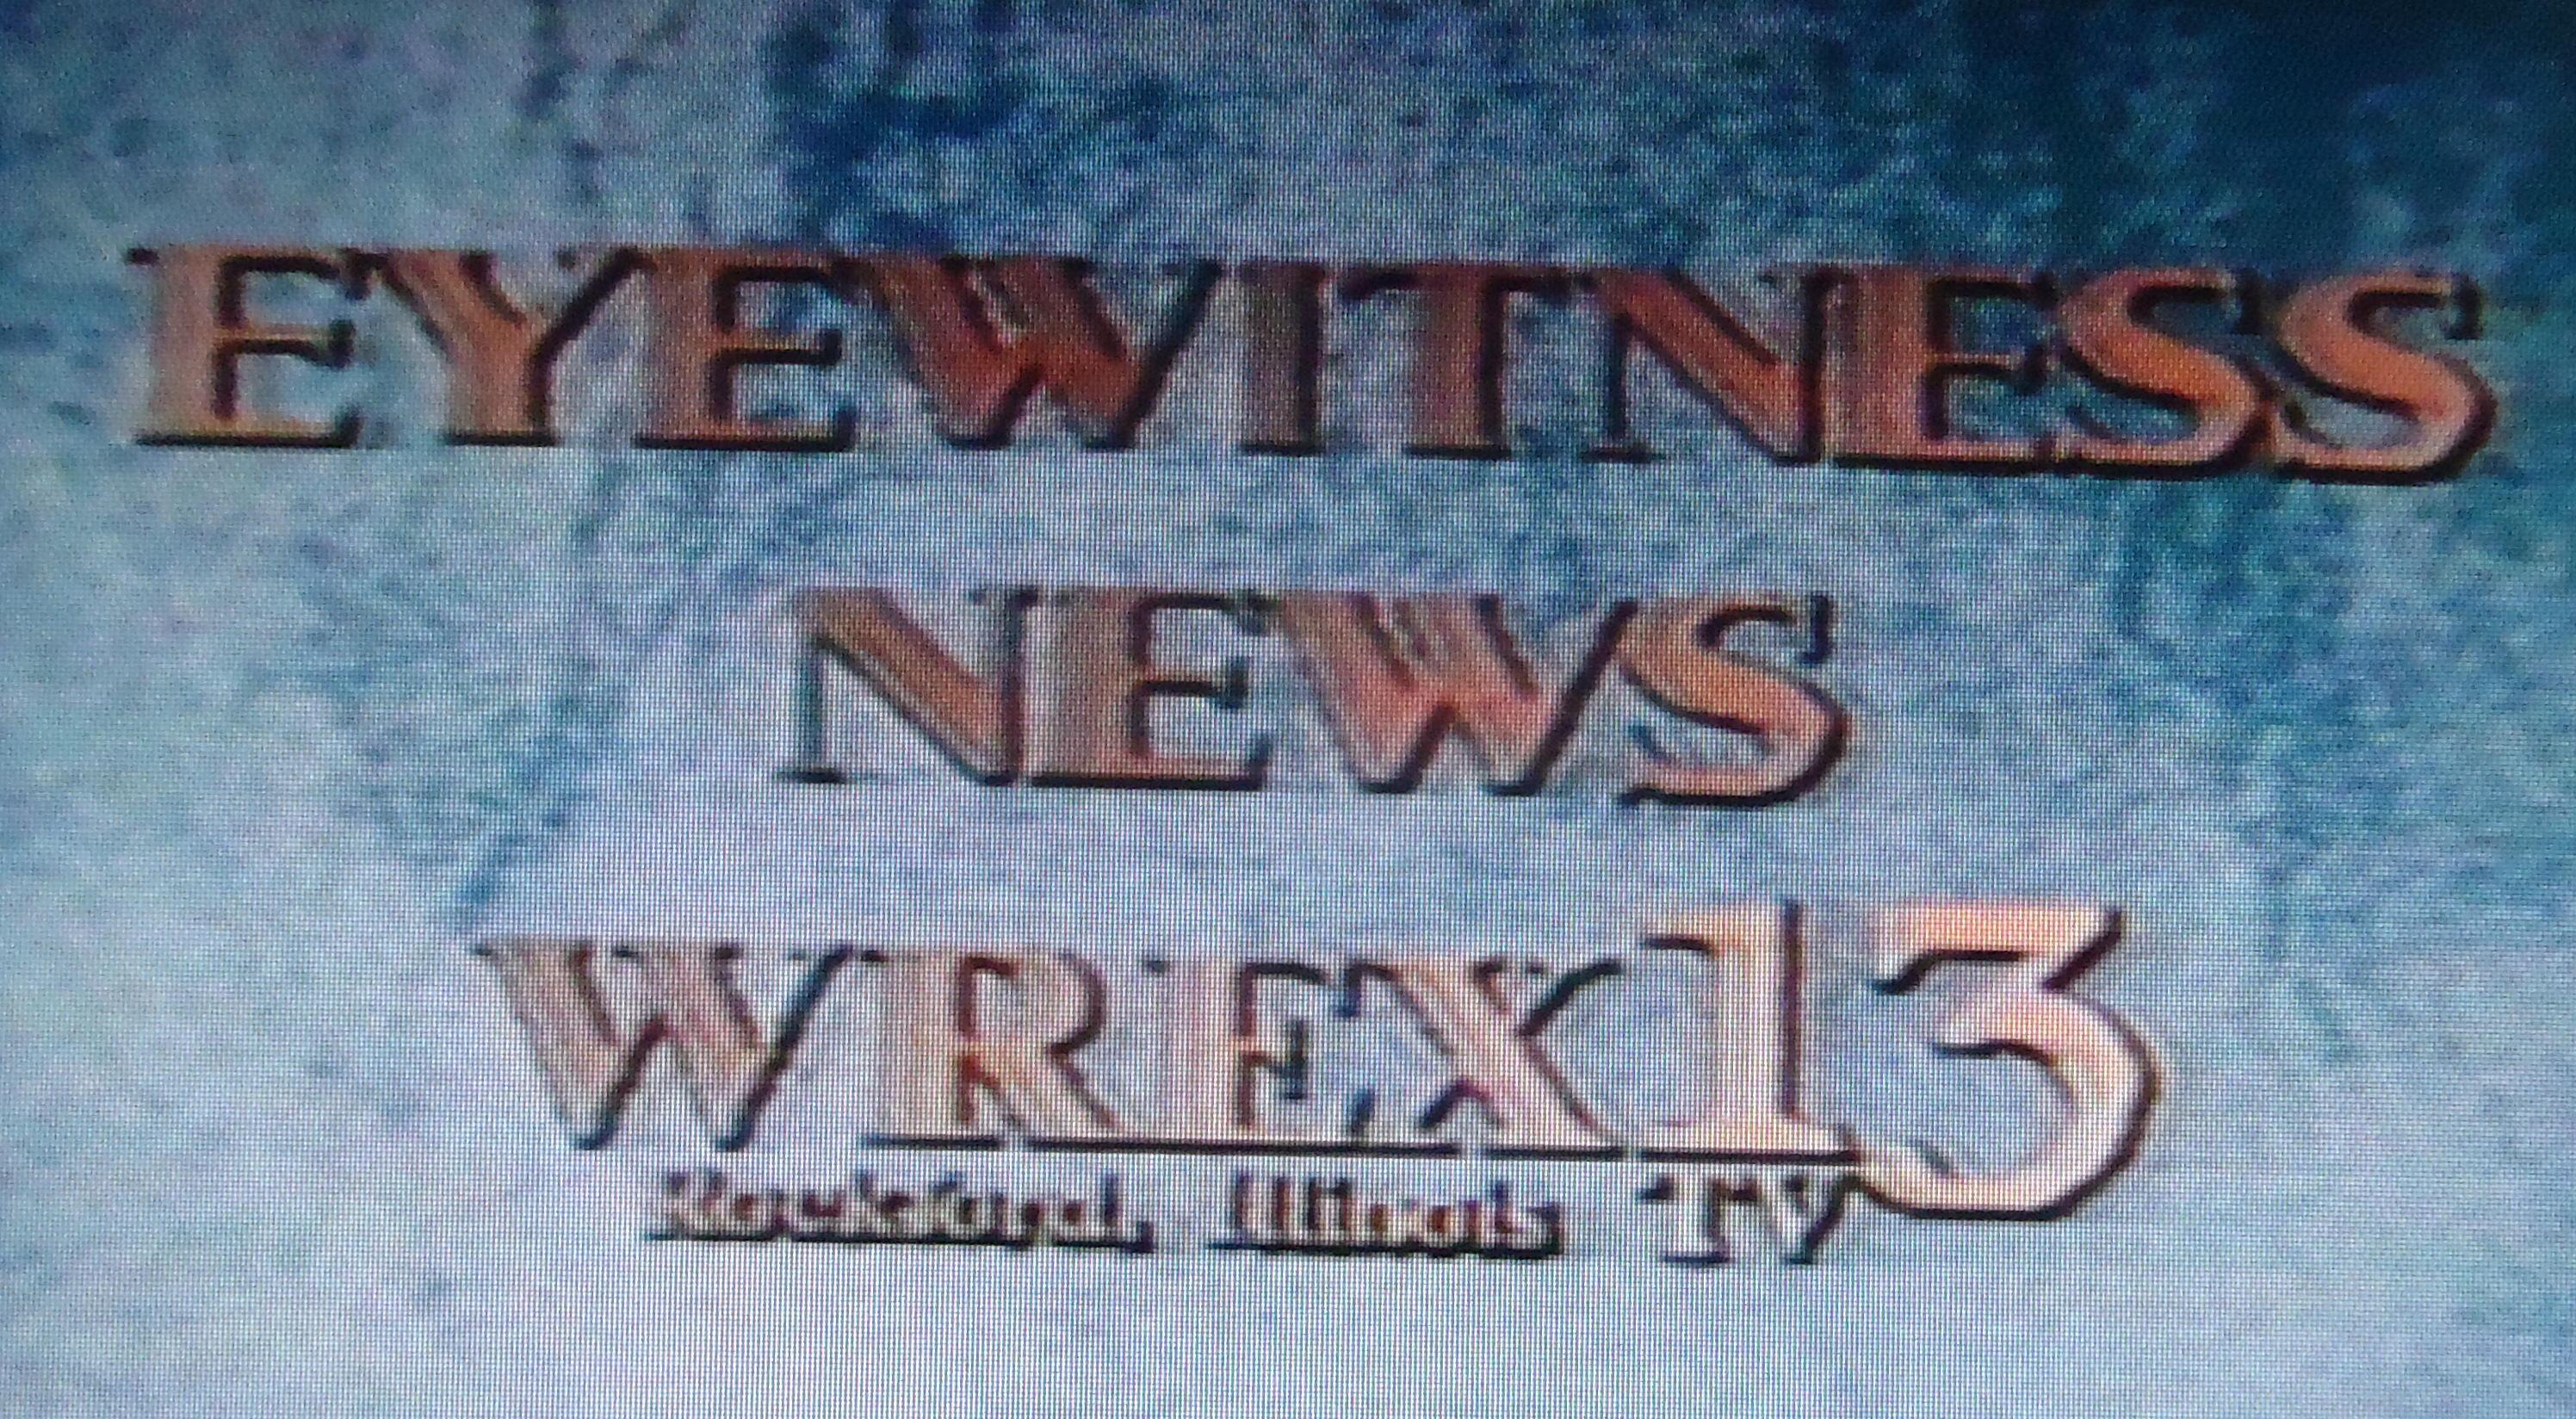 WREX - Logopedia, the logo and branding site